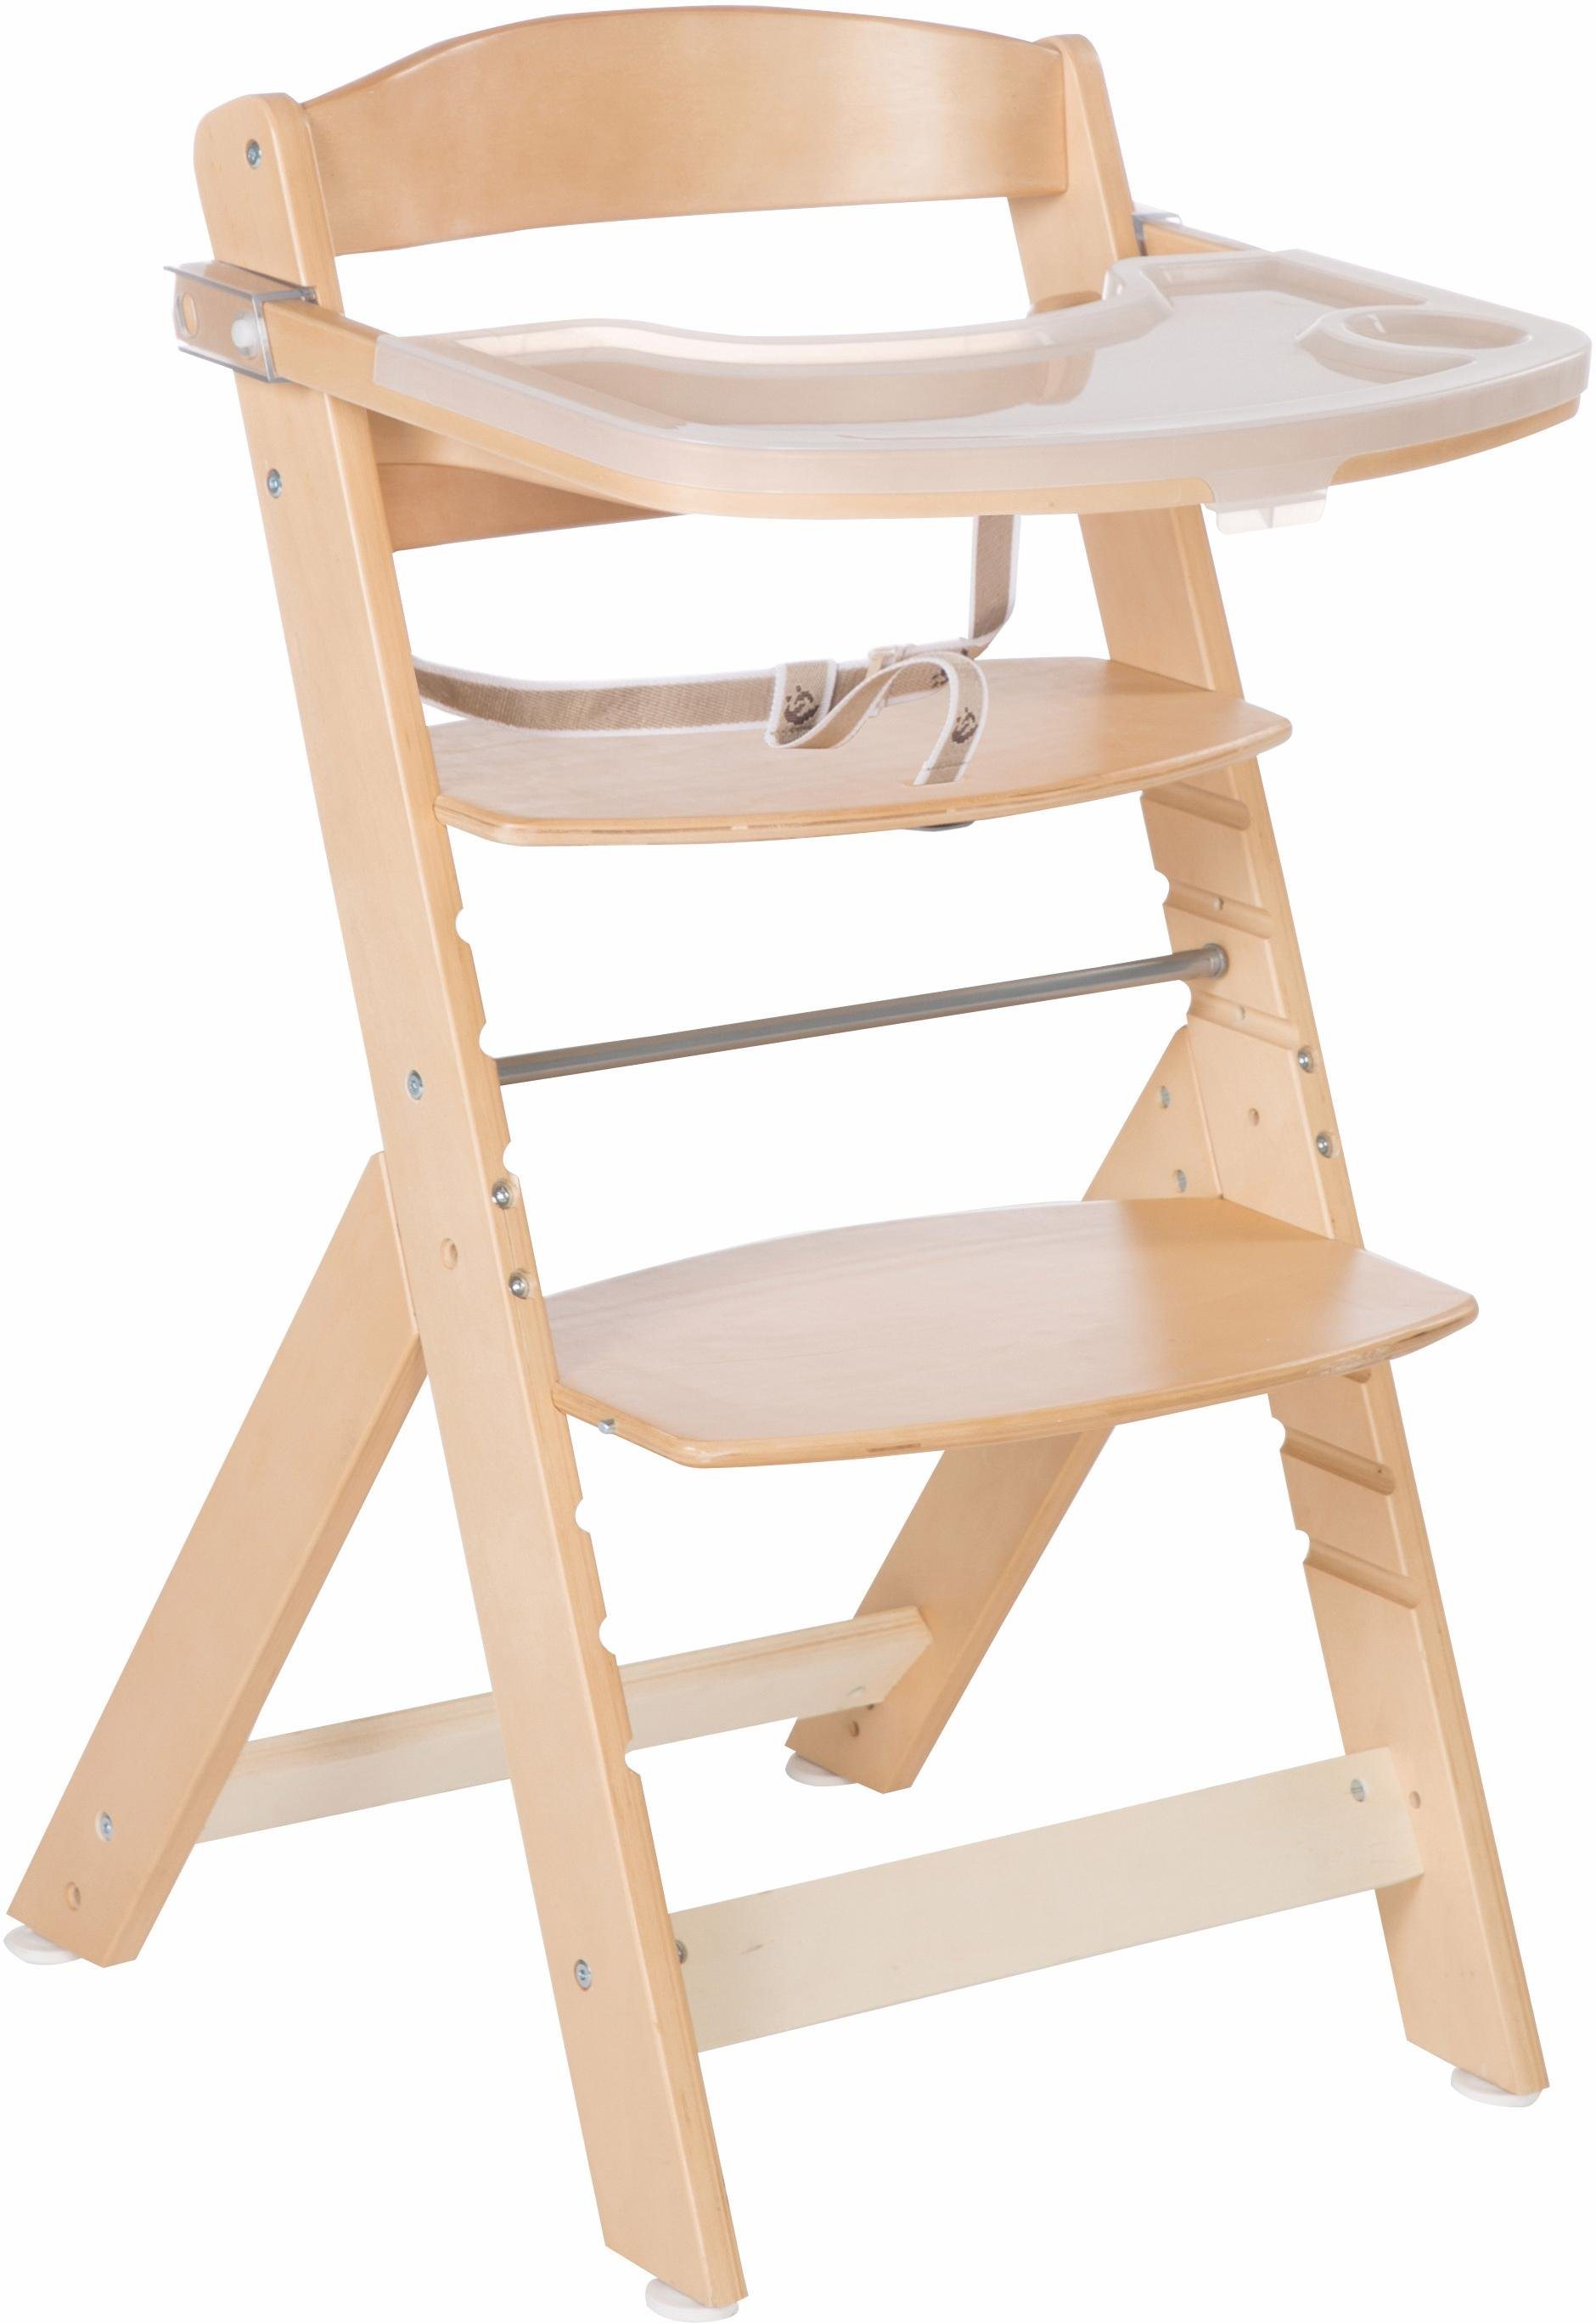 Roba Hochstuhl aus Holz, »Treppenhochstuhl Sit up Super Maxi, natur«   Kinderzimmer > Kinderzimmerstühle > Hochstühle   Holz   Roba®